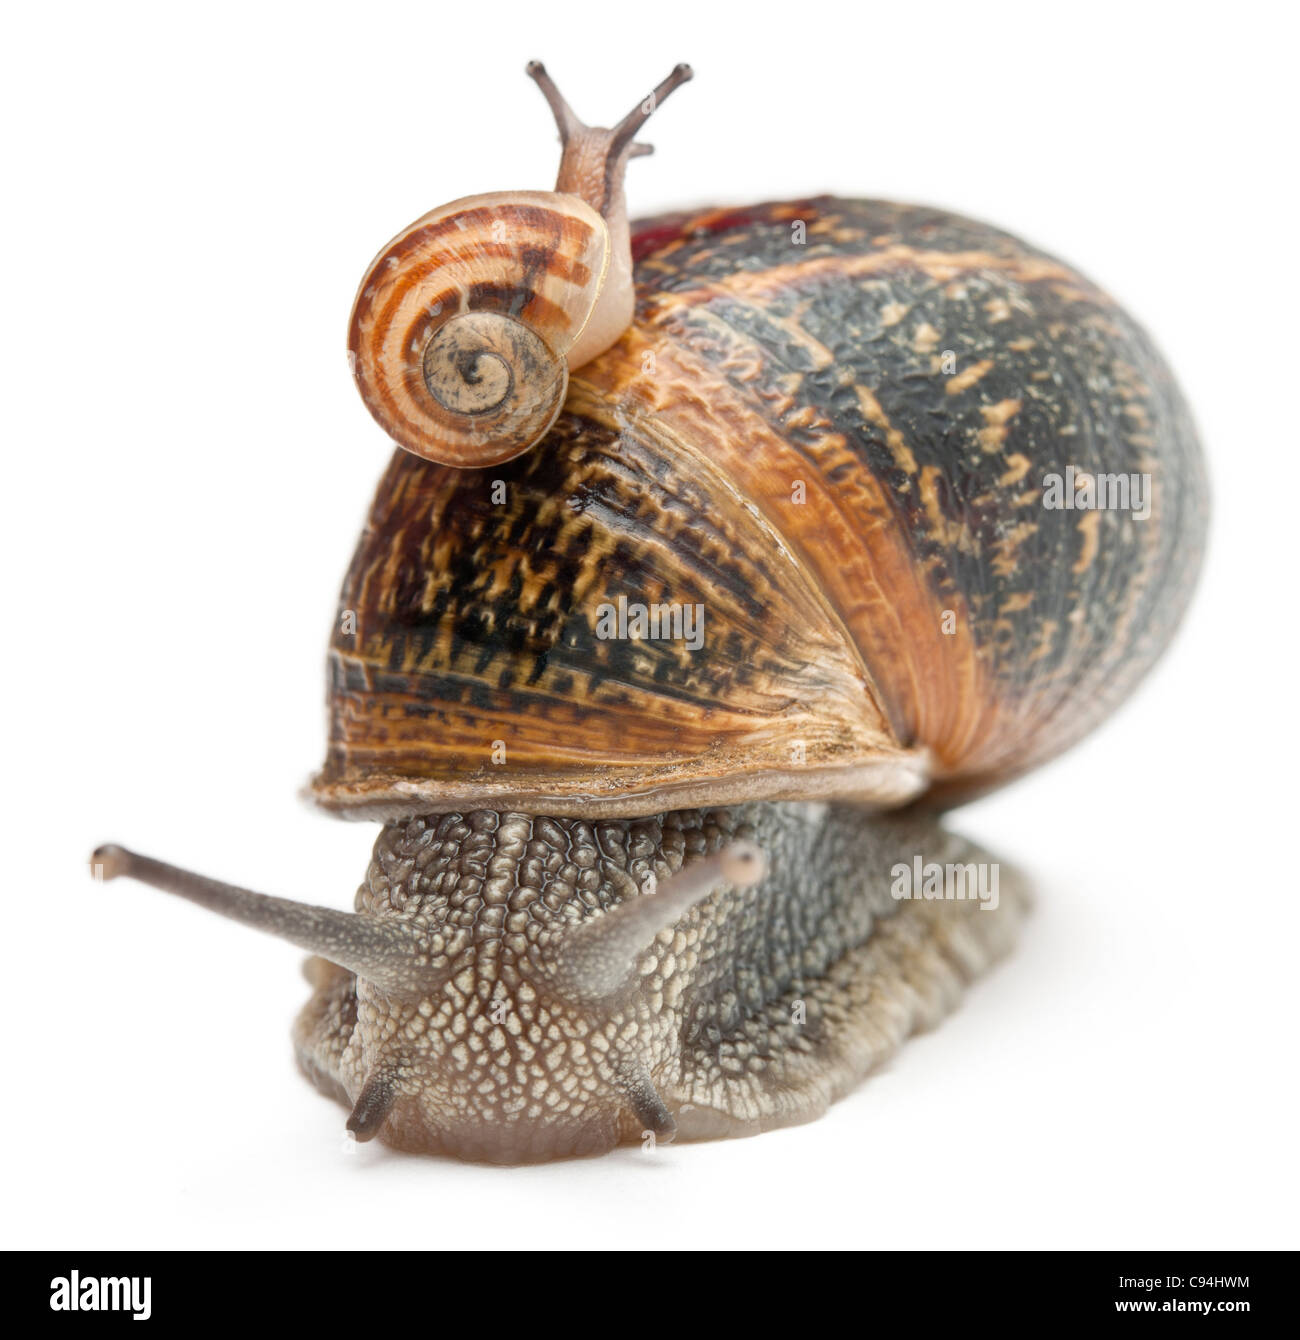 baby snail stock photos u0026 baby snail stock images alamy